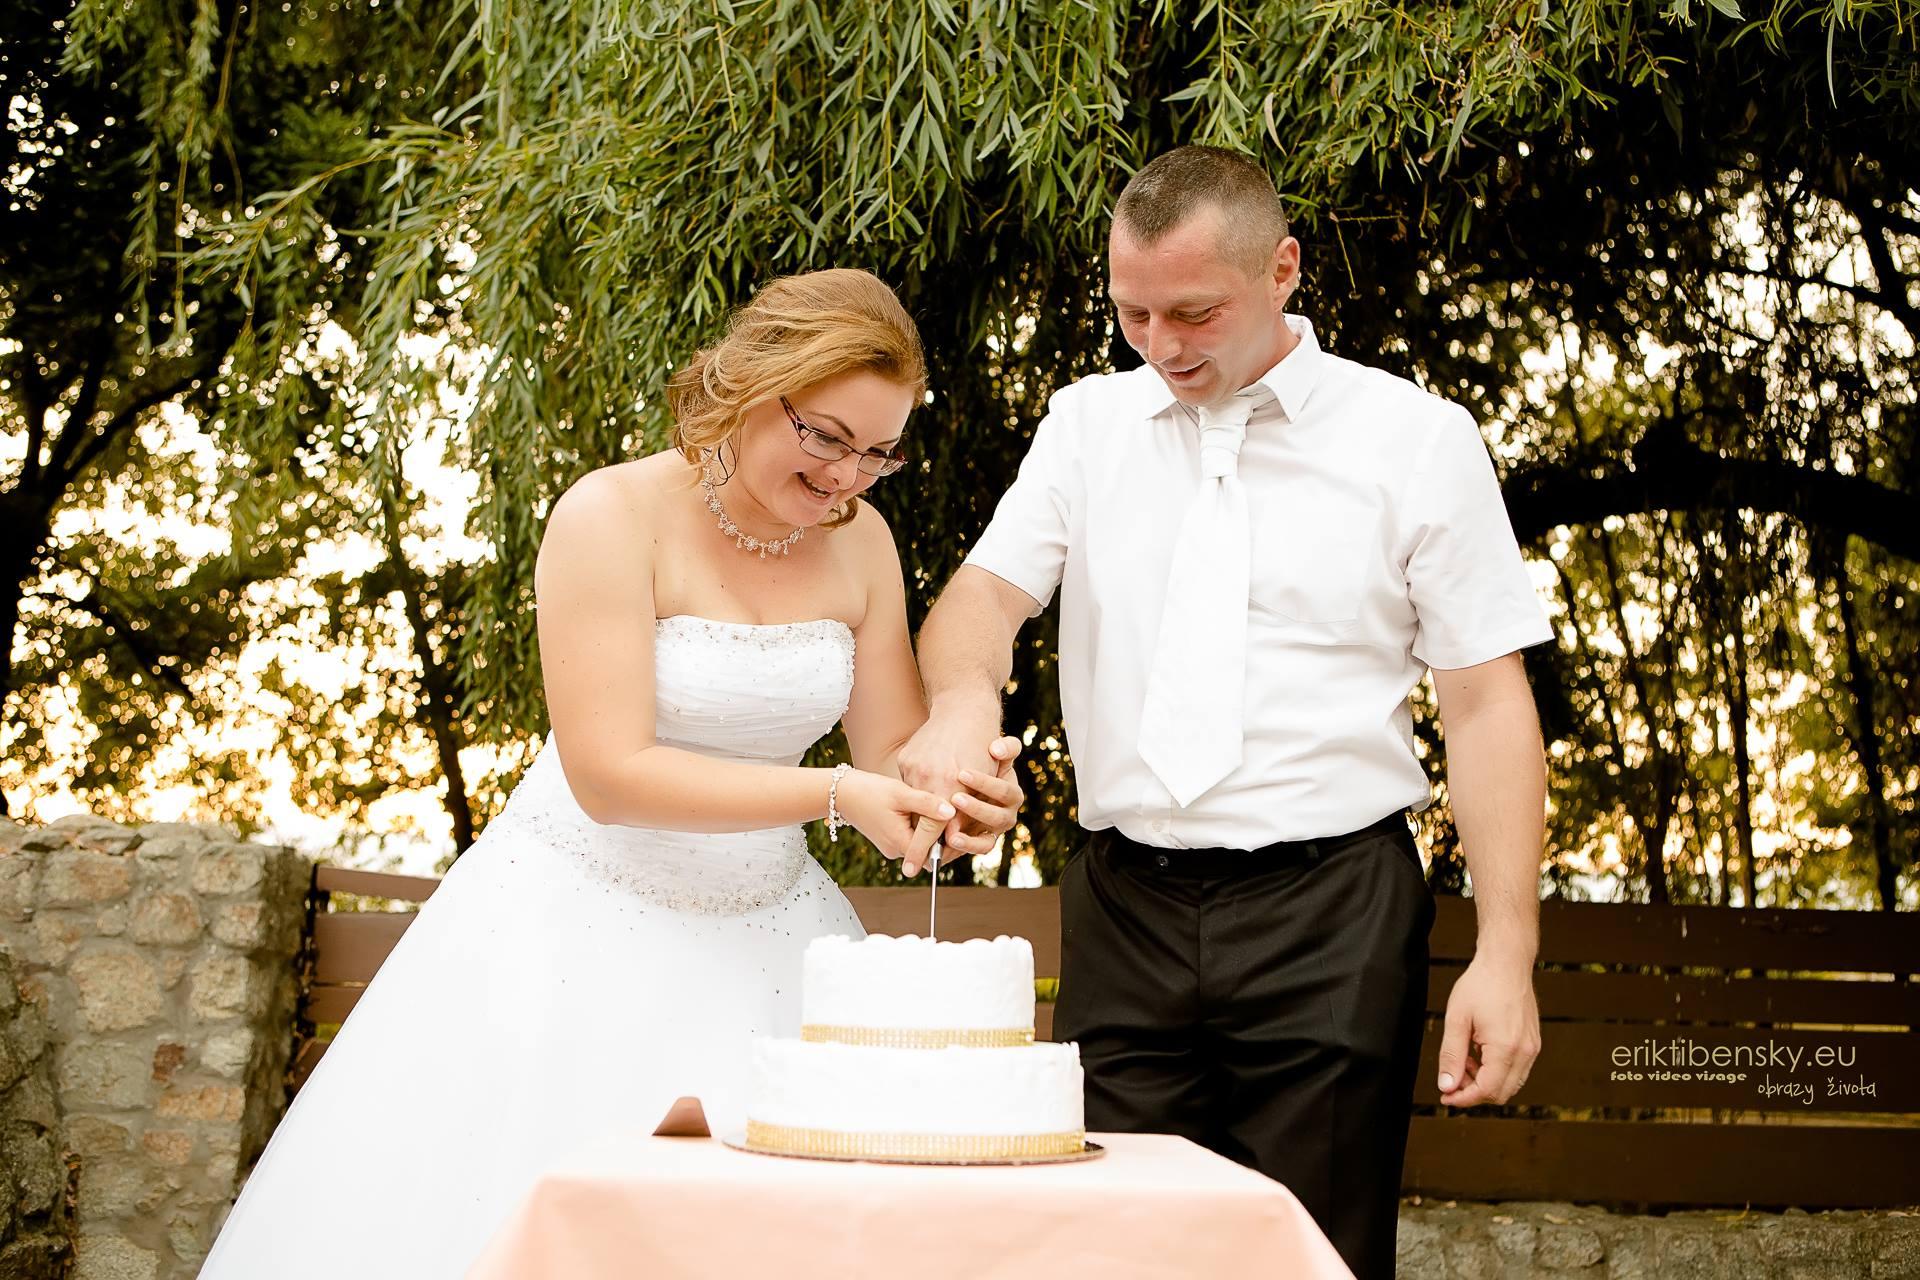 eriktibensky-eu-svadobny-fotograf-wedding-photographer-3054